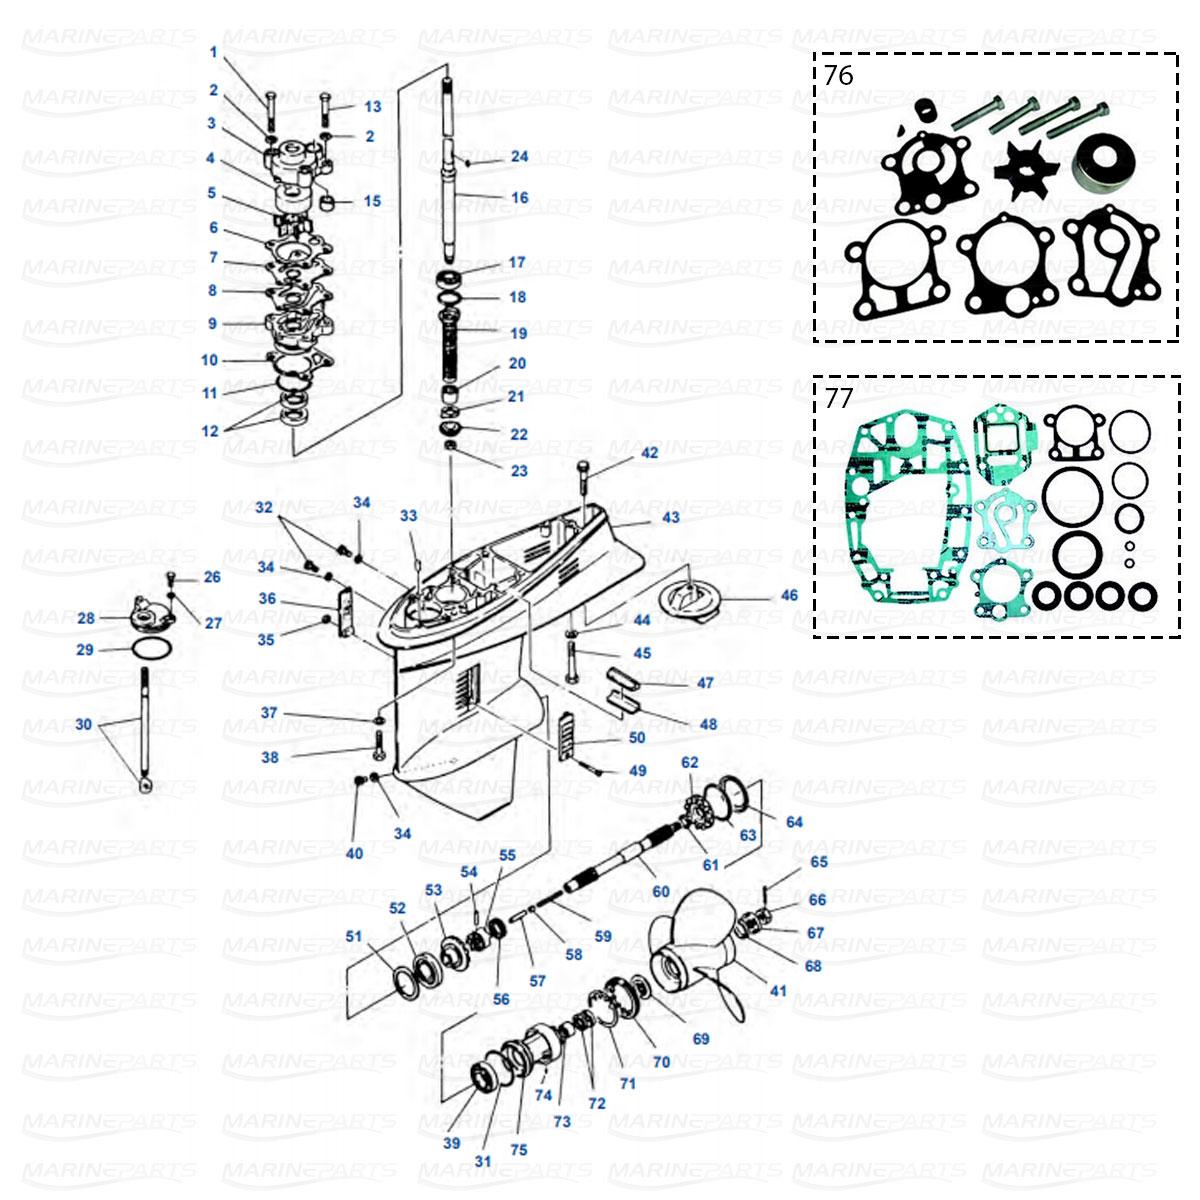 Yamaha gearcase parts for outboard motor, marineparts.eu